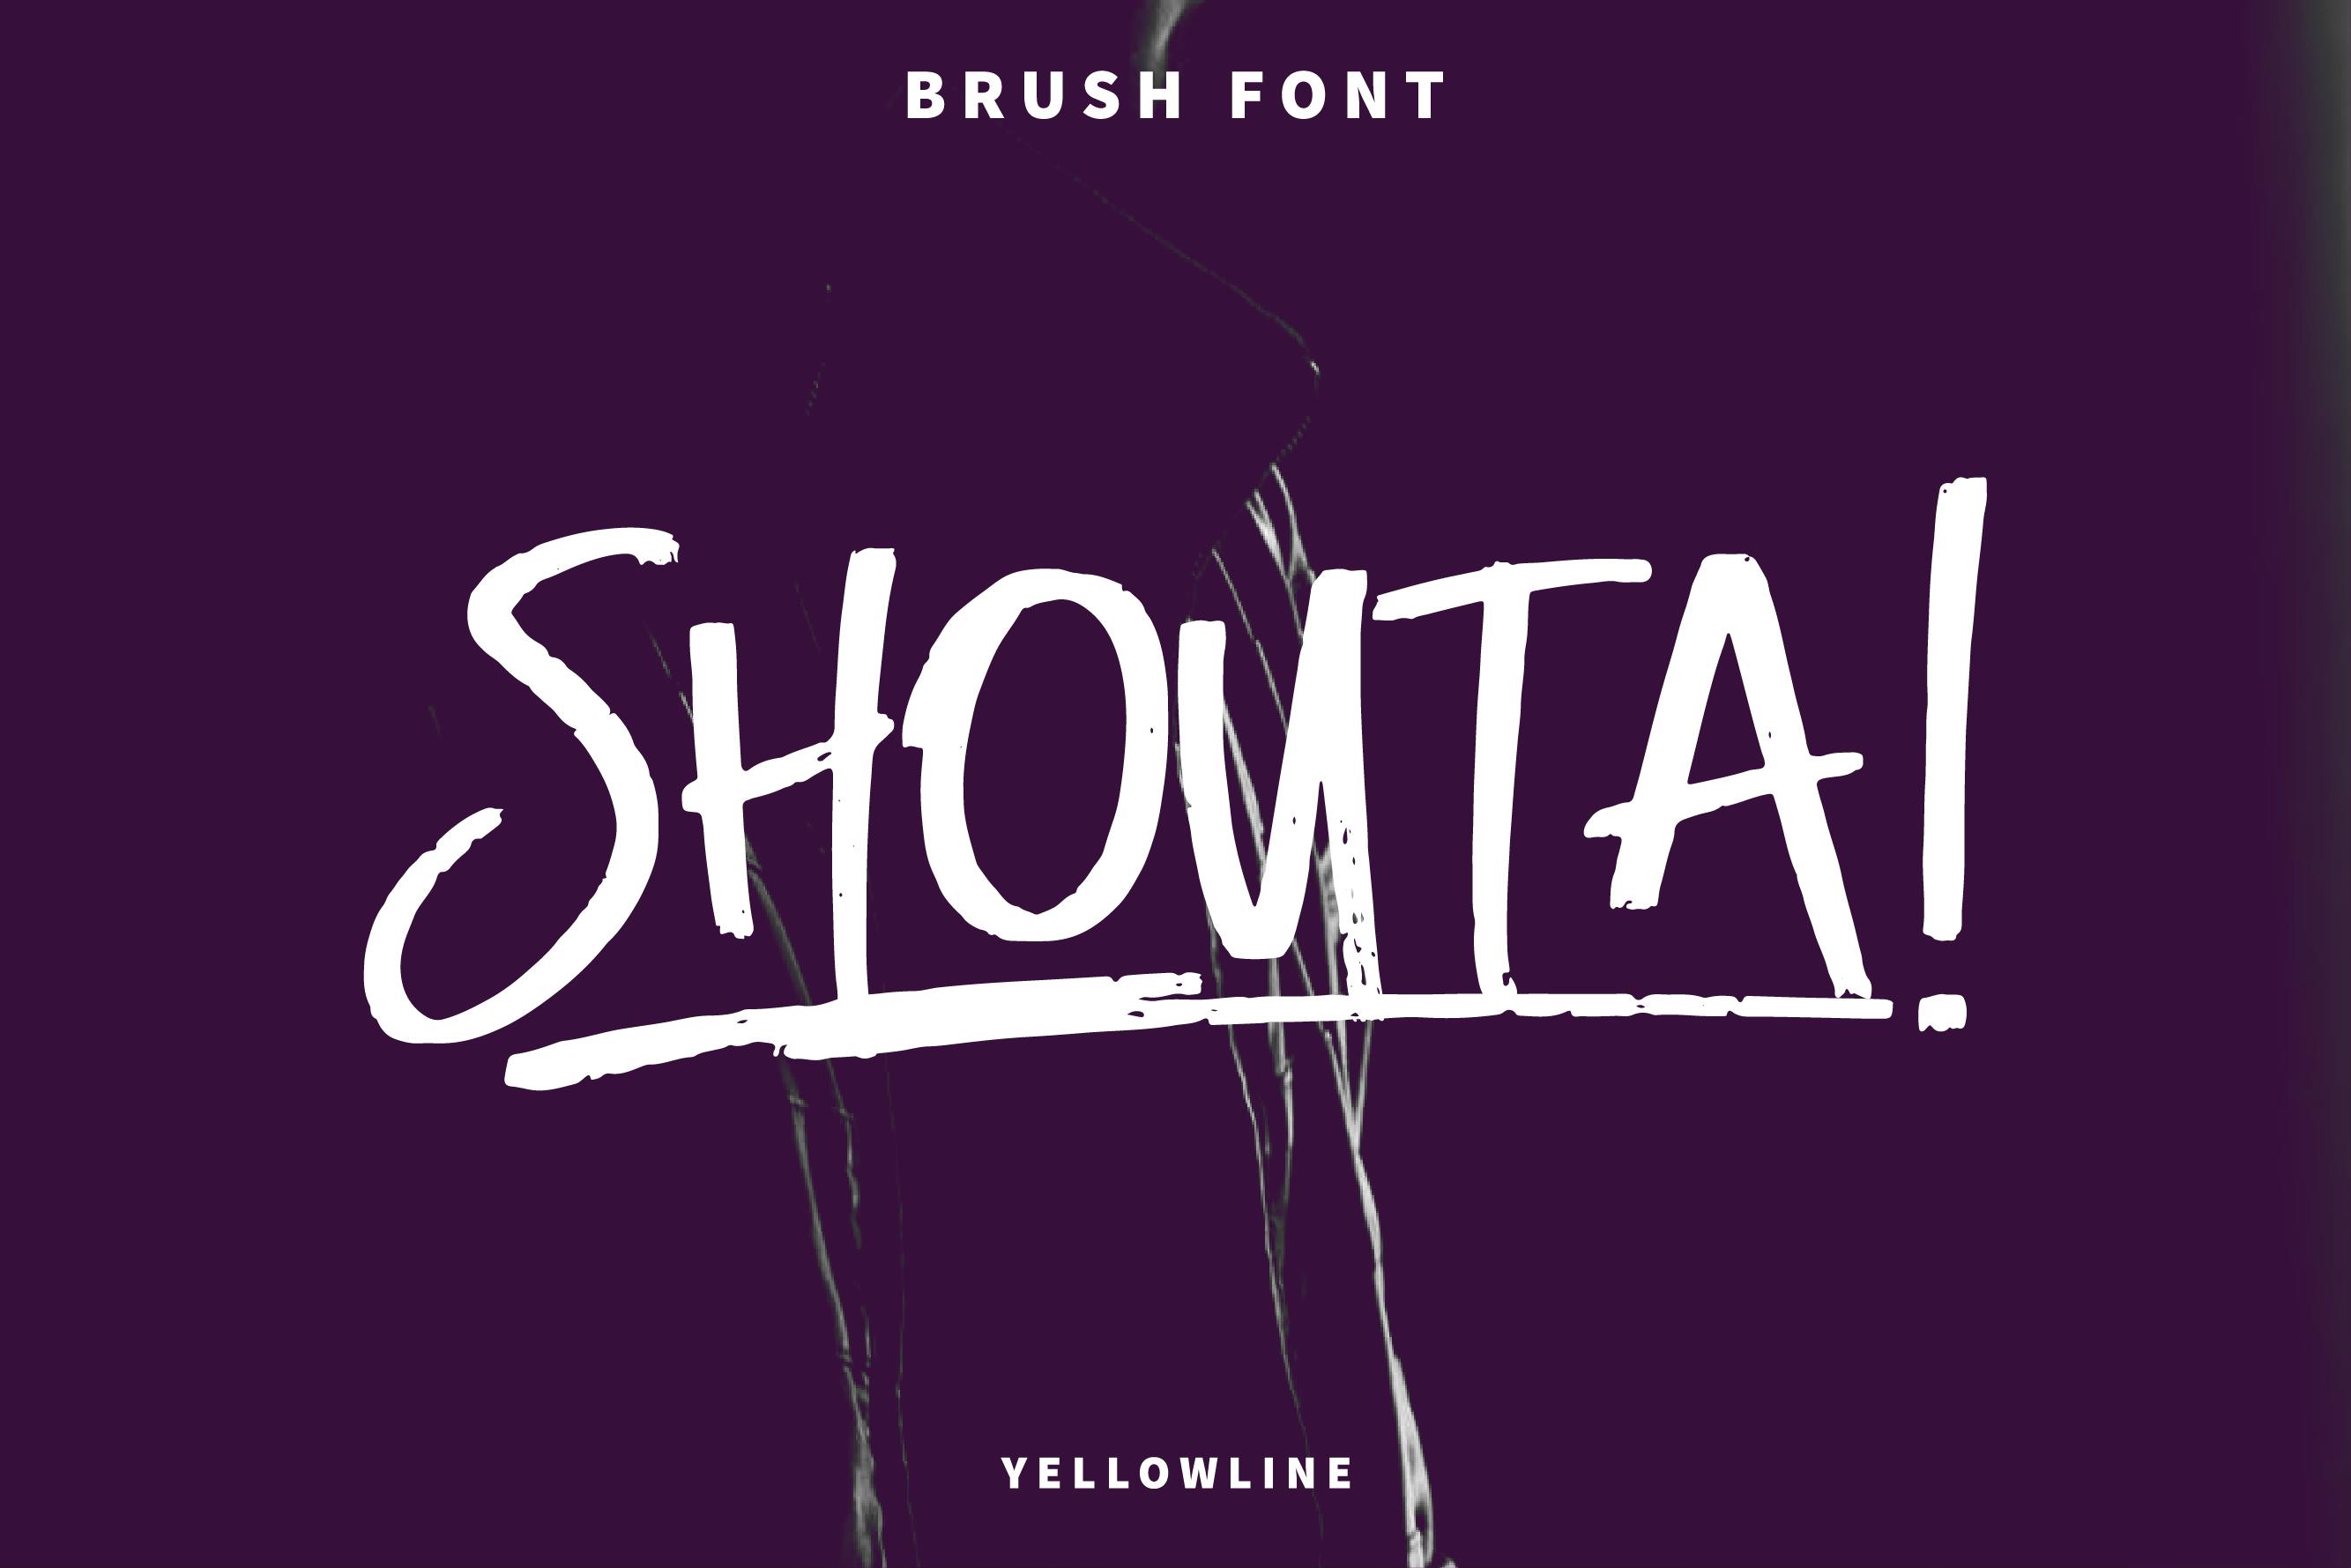 Shouta! Brush Font example image 1